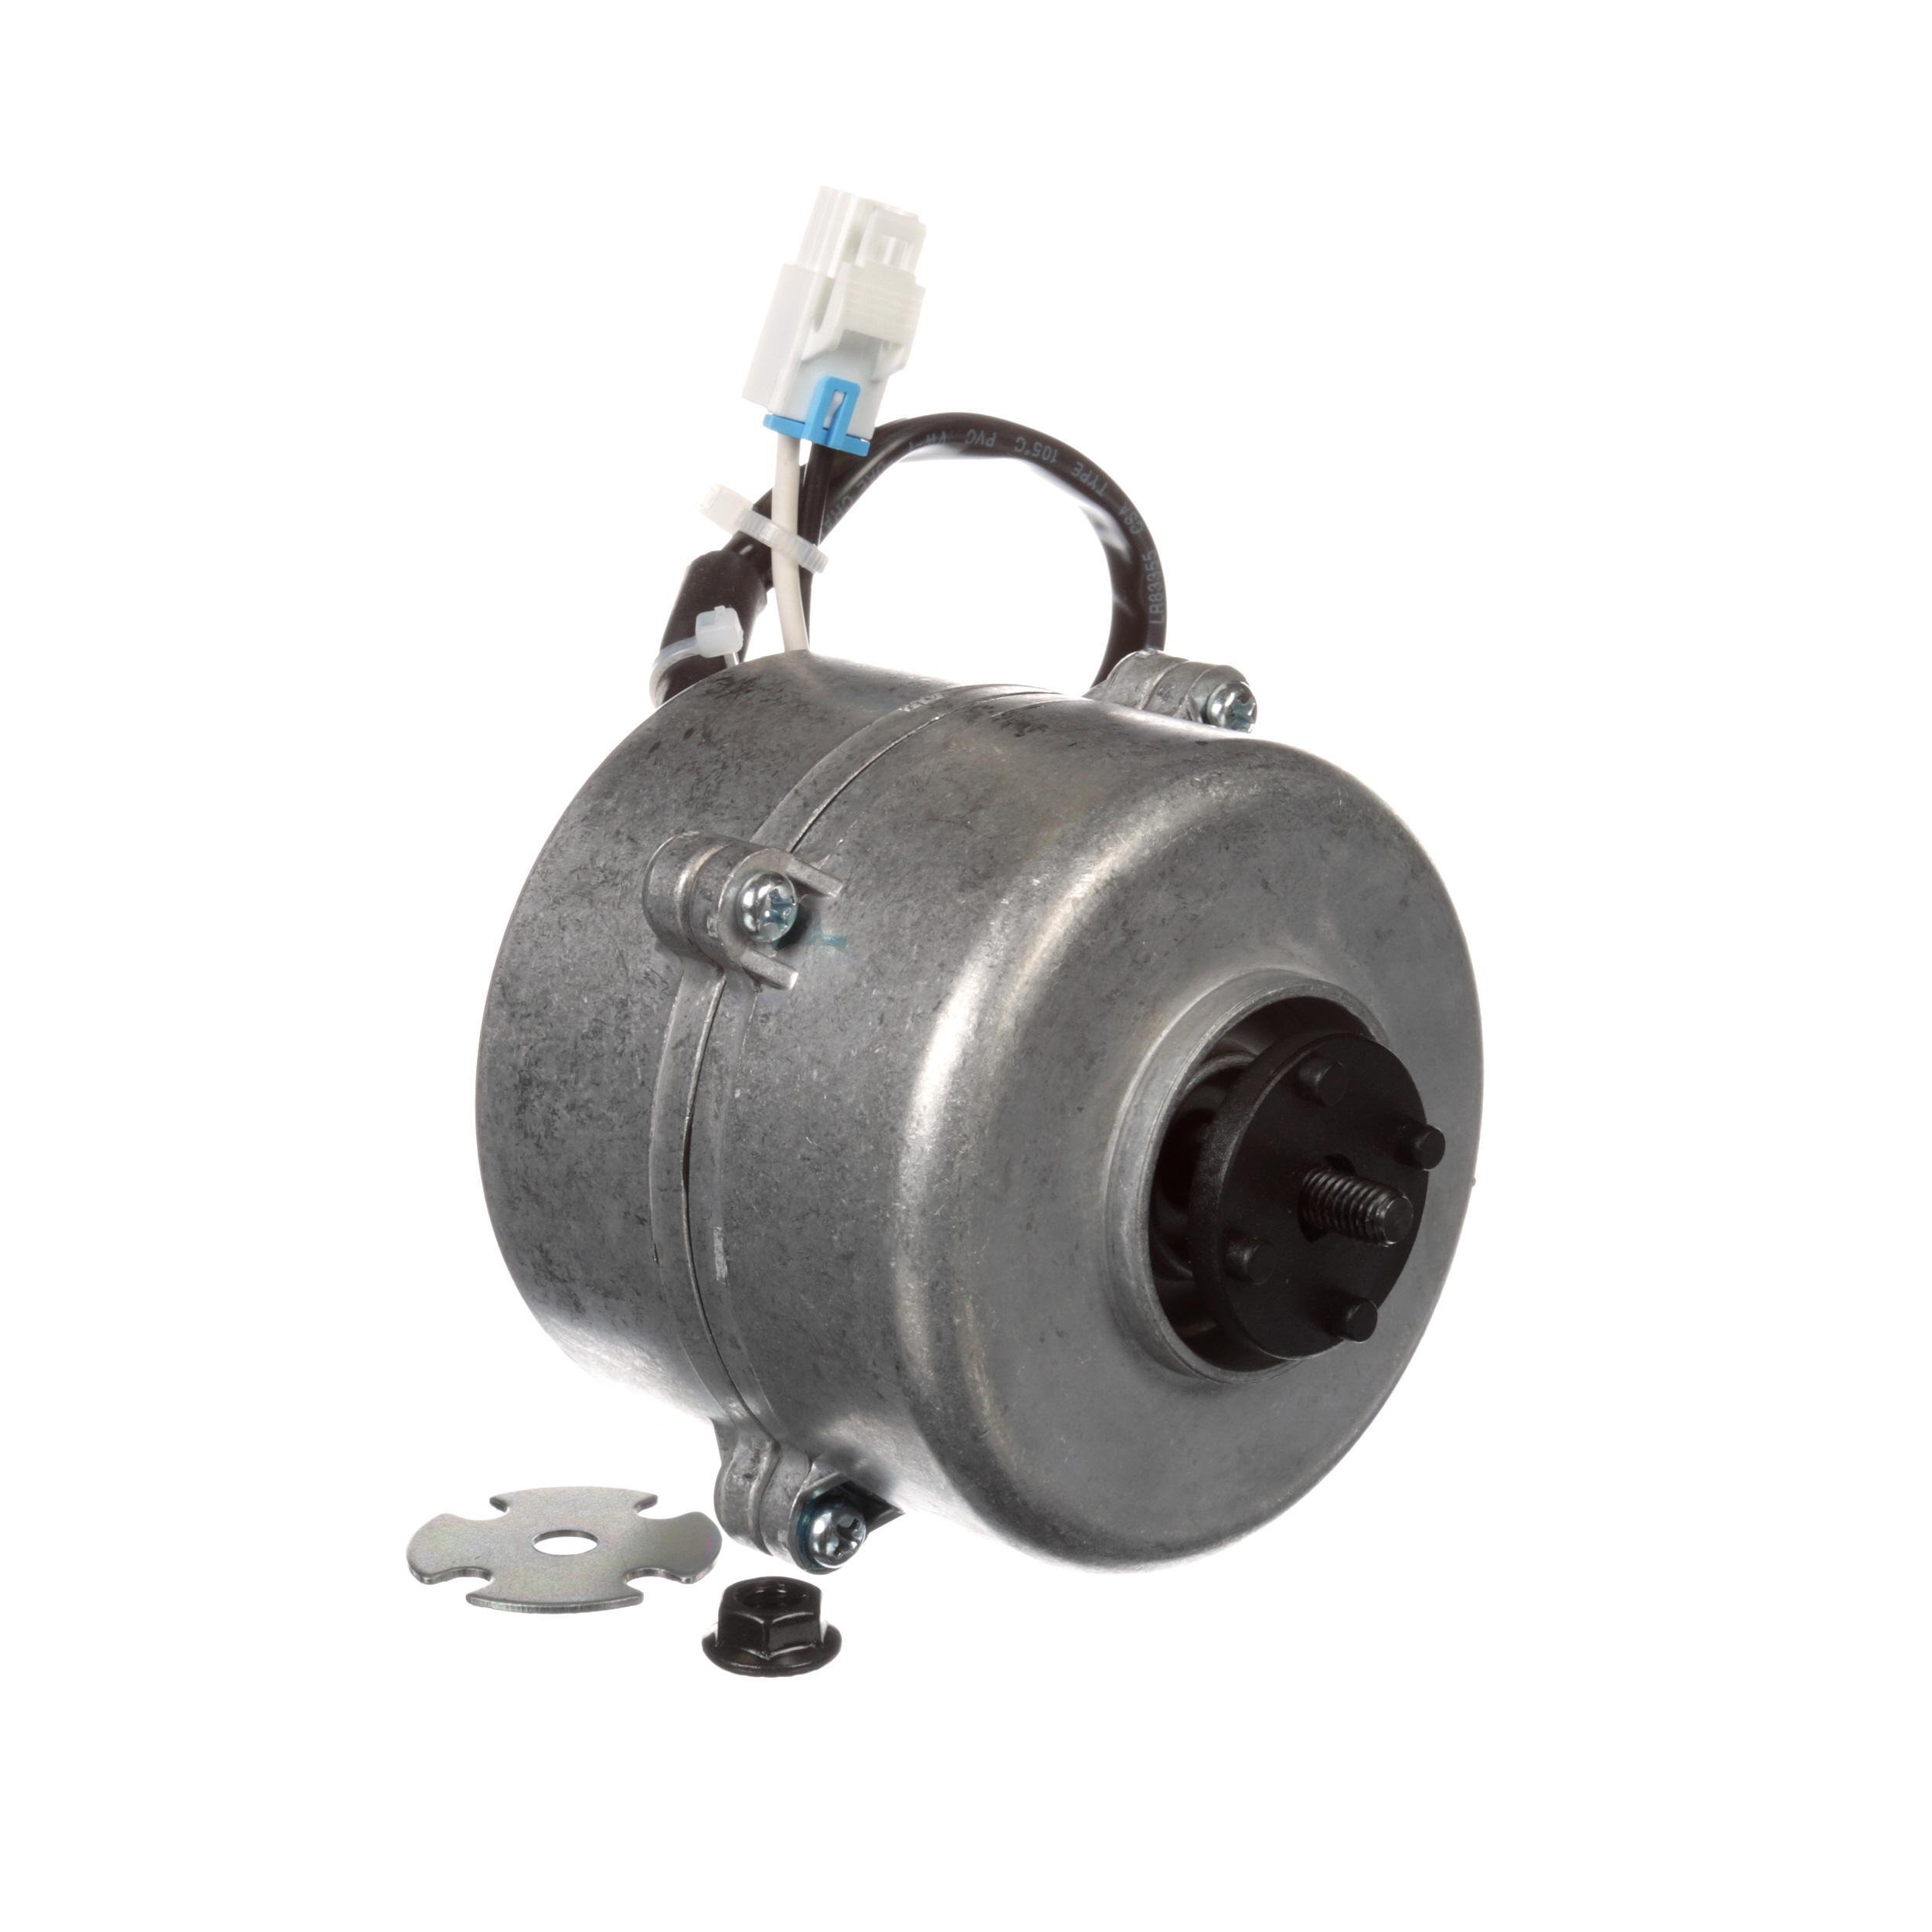 Turbo Air Evap Fan Motor Part 3963328120